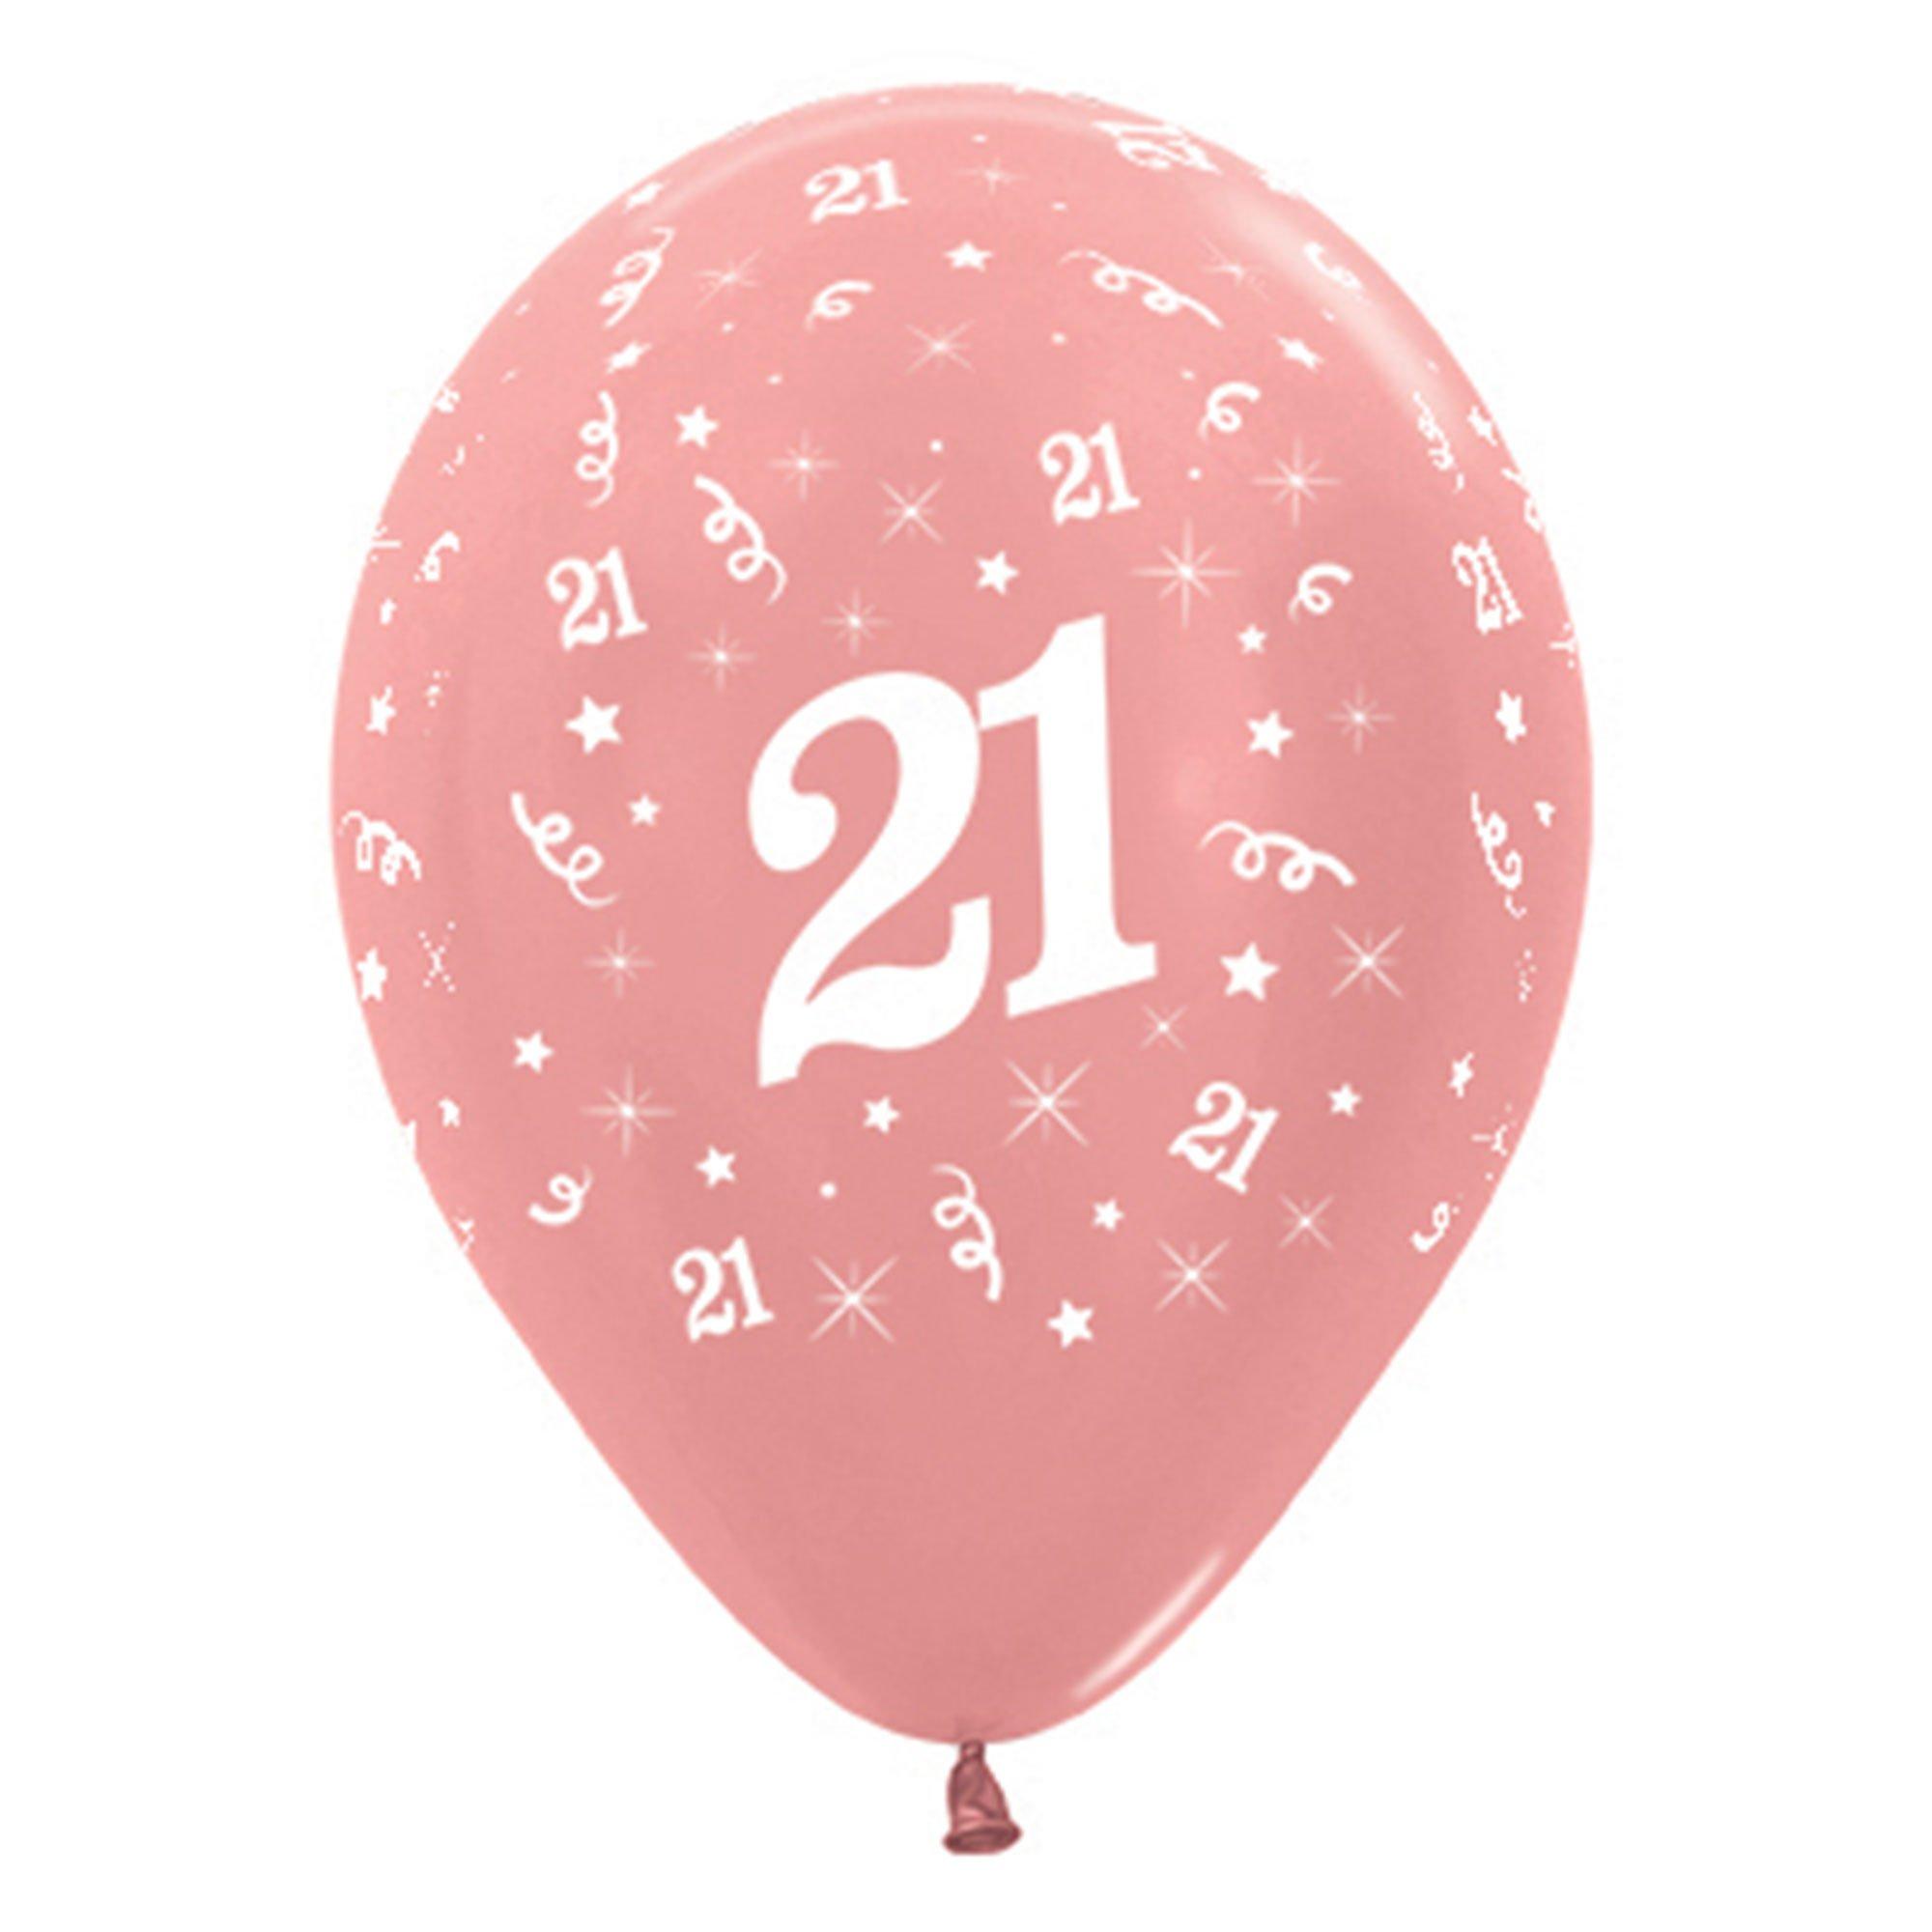 Sempertex 30cm Age 21 Metallic Rose Gold Latex Balloons, 6PK